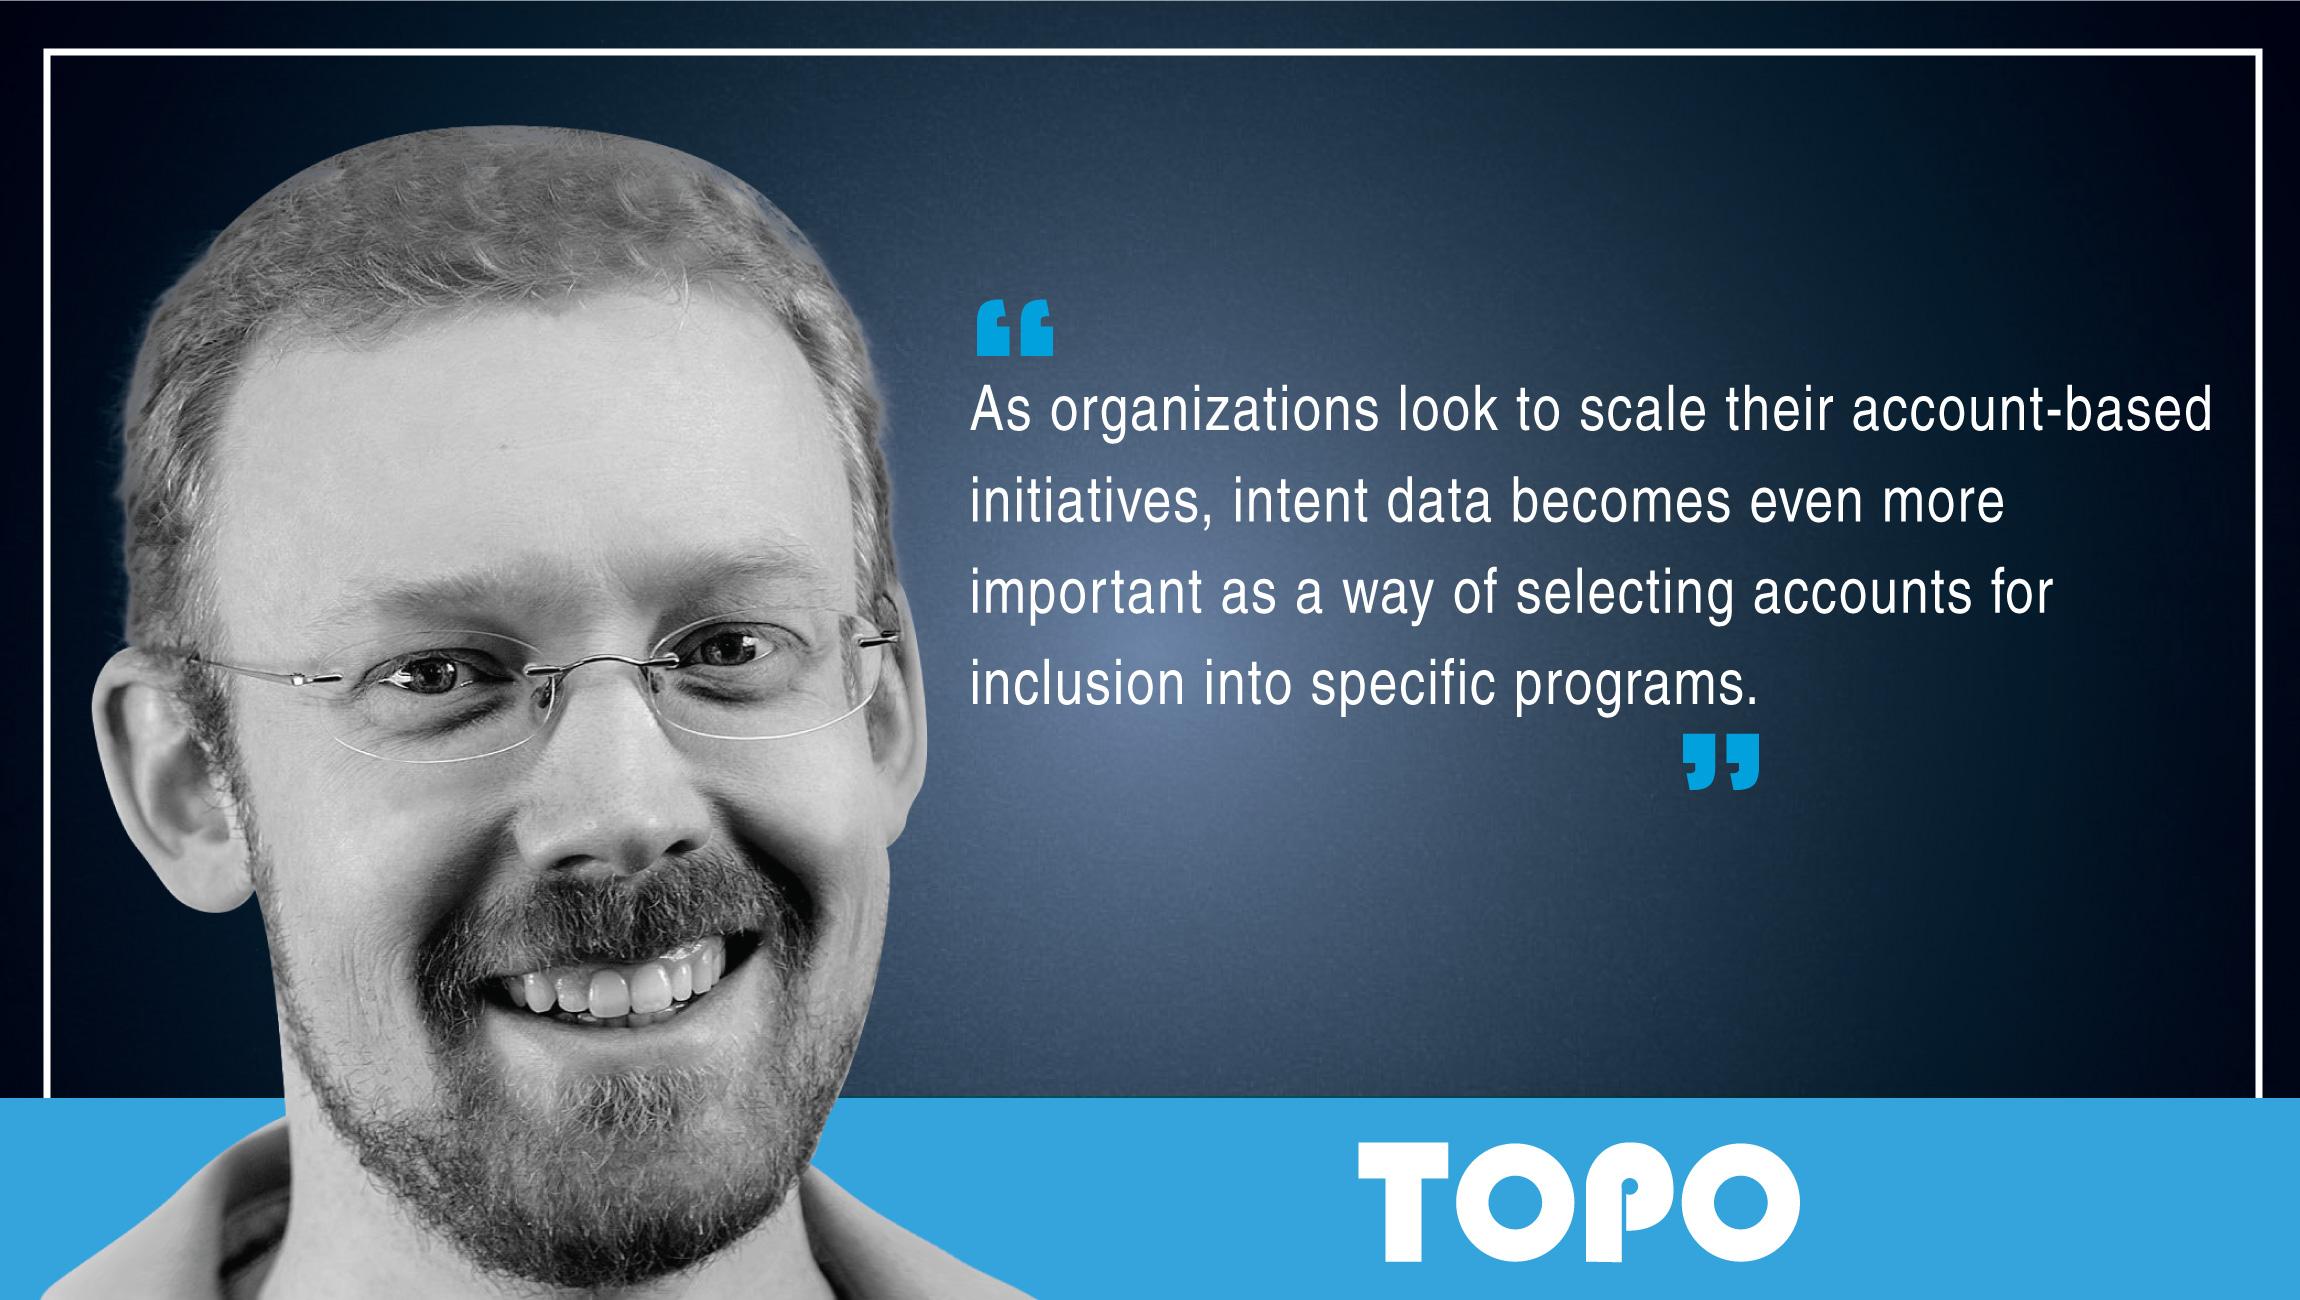 Eric Wittlake, Sr. Marketing Analyst, TOPO